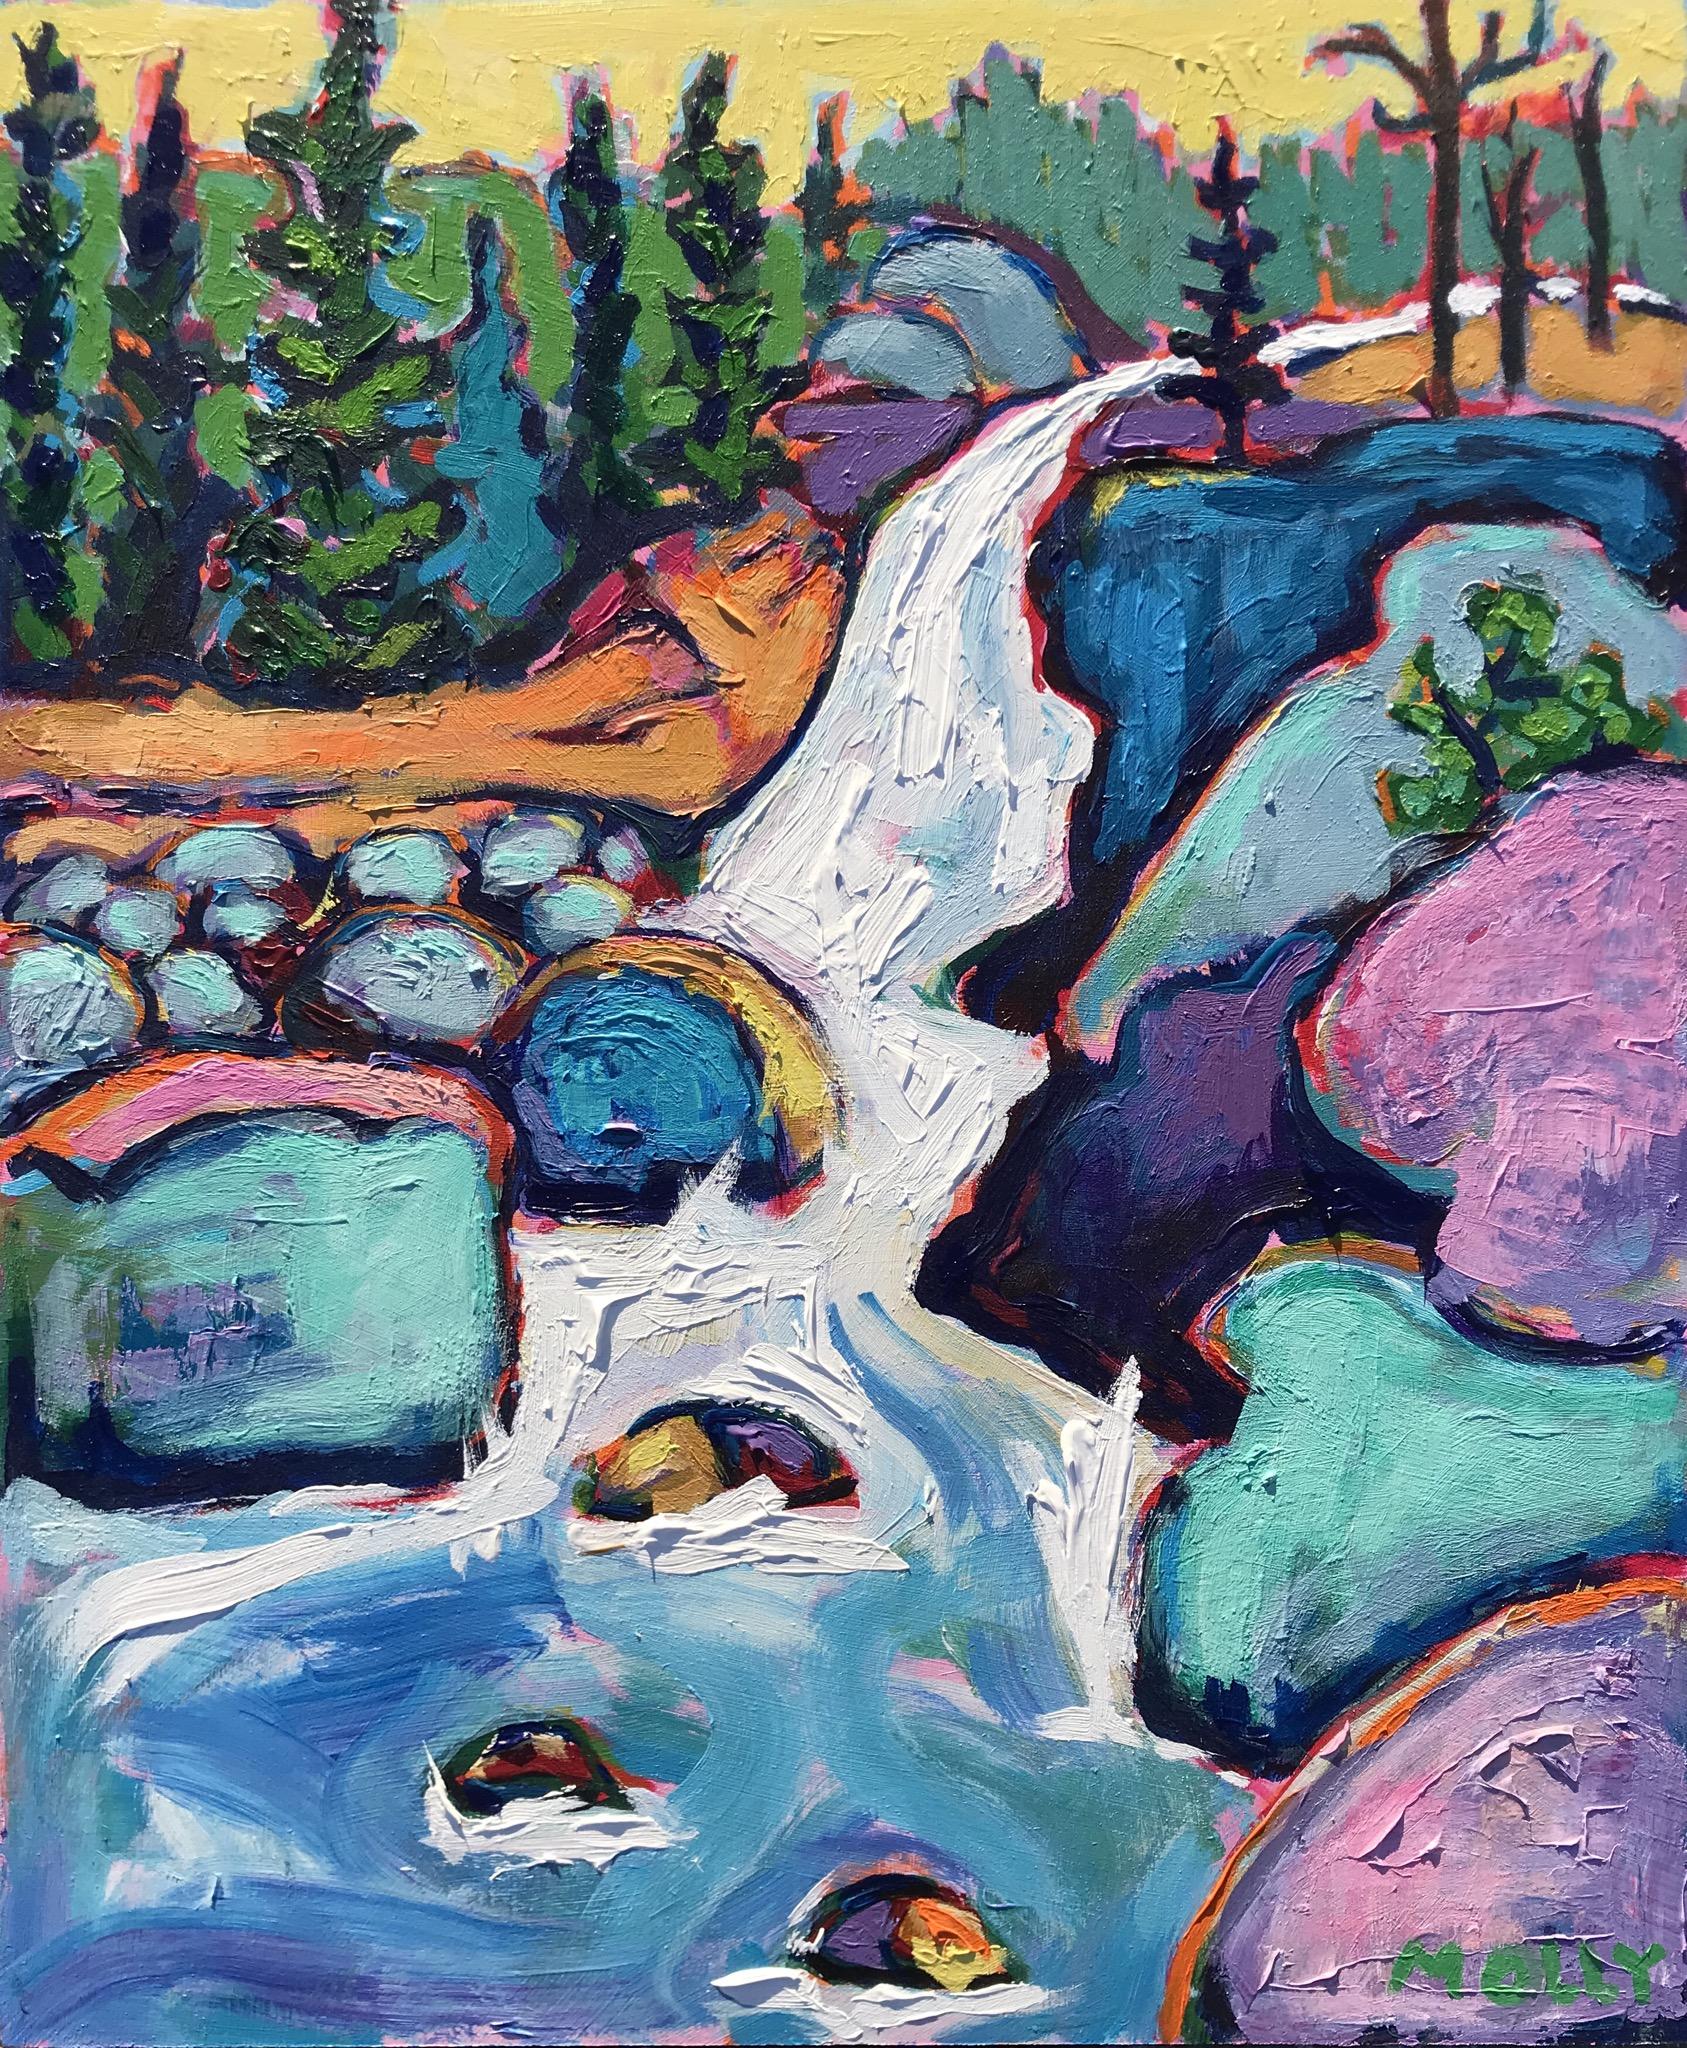 Alberta Falls, 24x20, Acrylic on Canvas